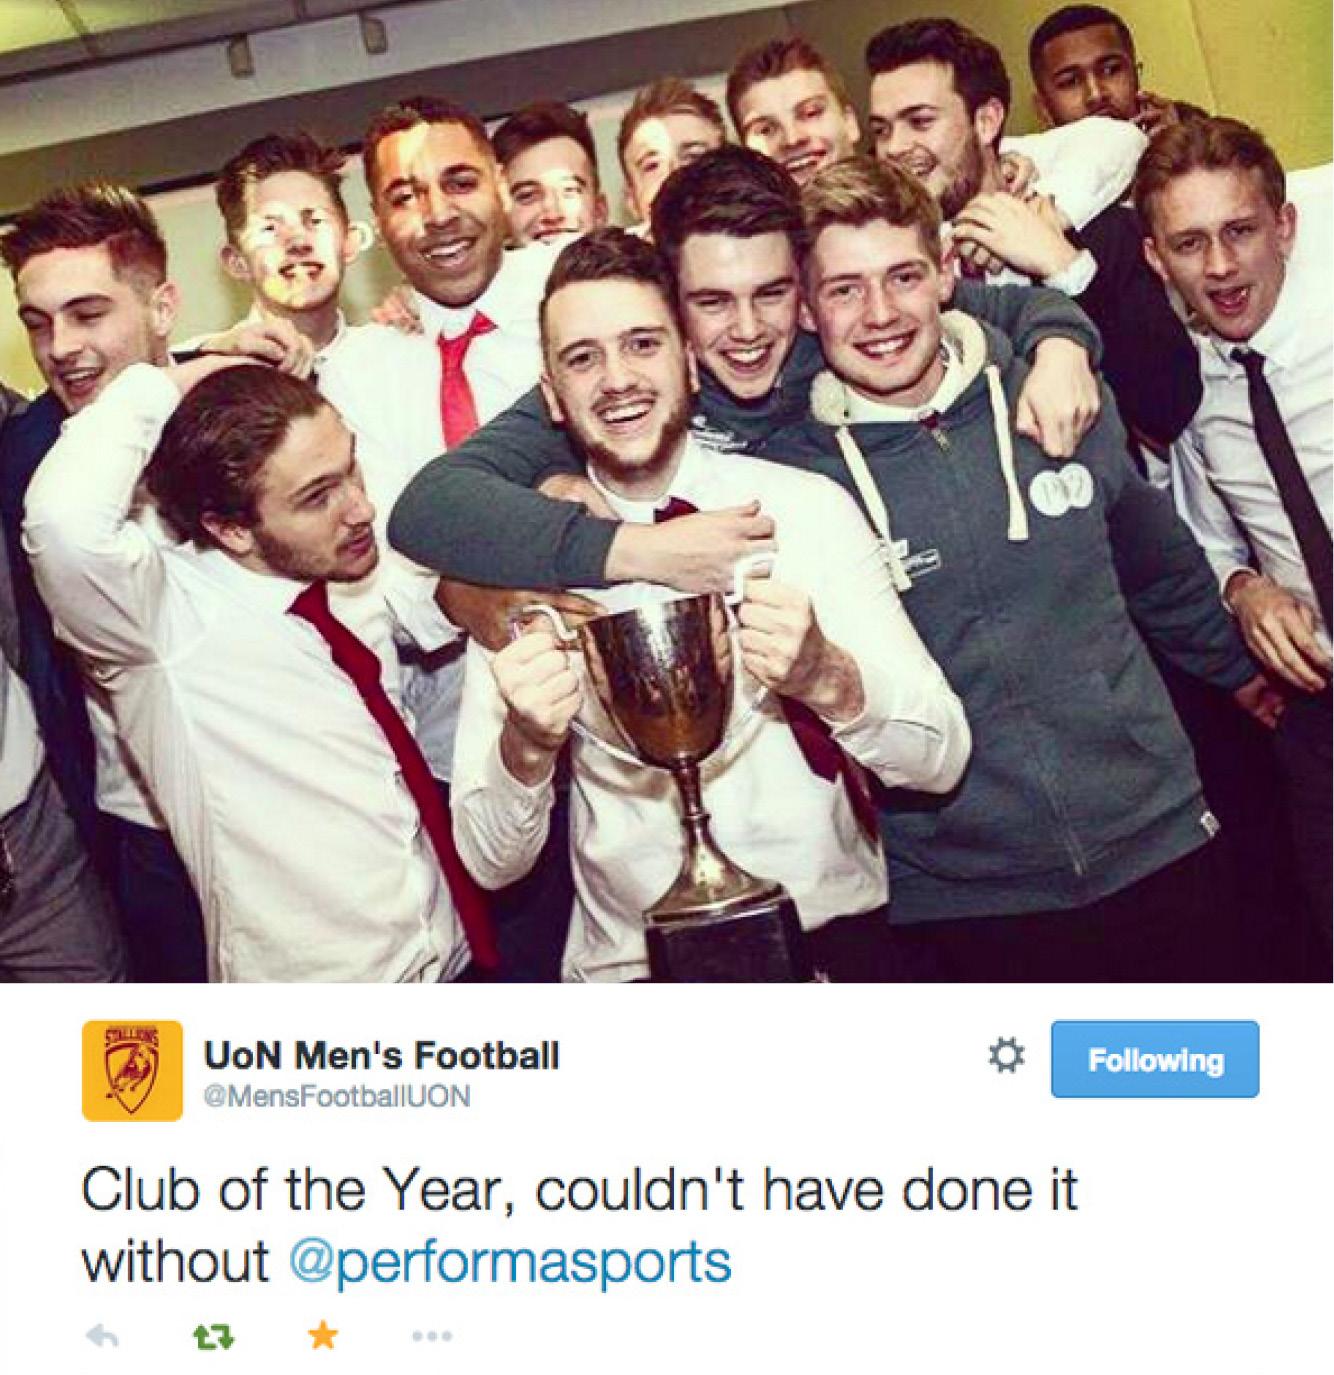 University of Northampton Football Team club of the year 2015